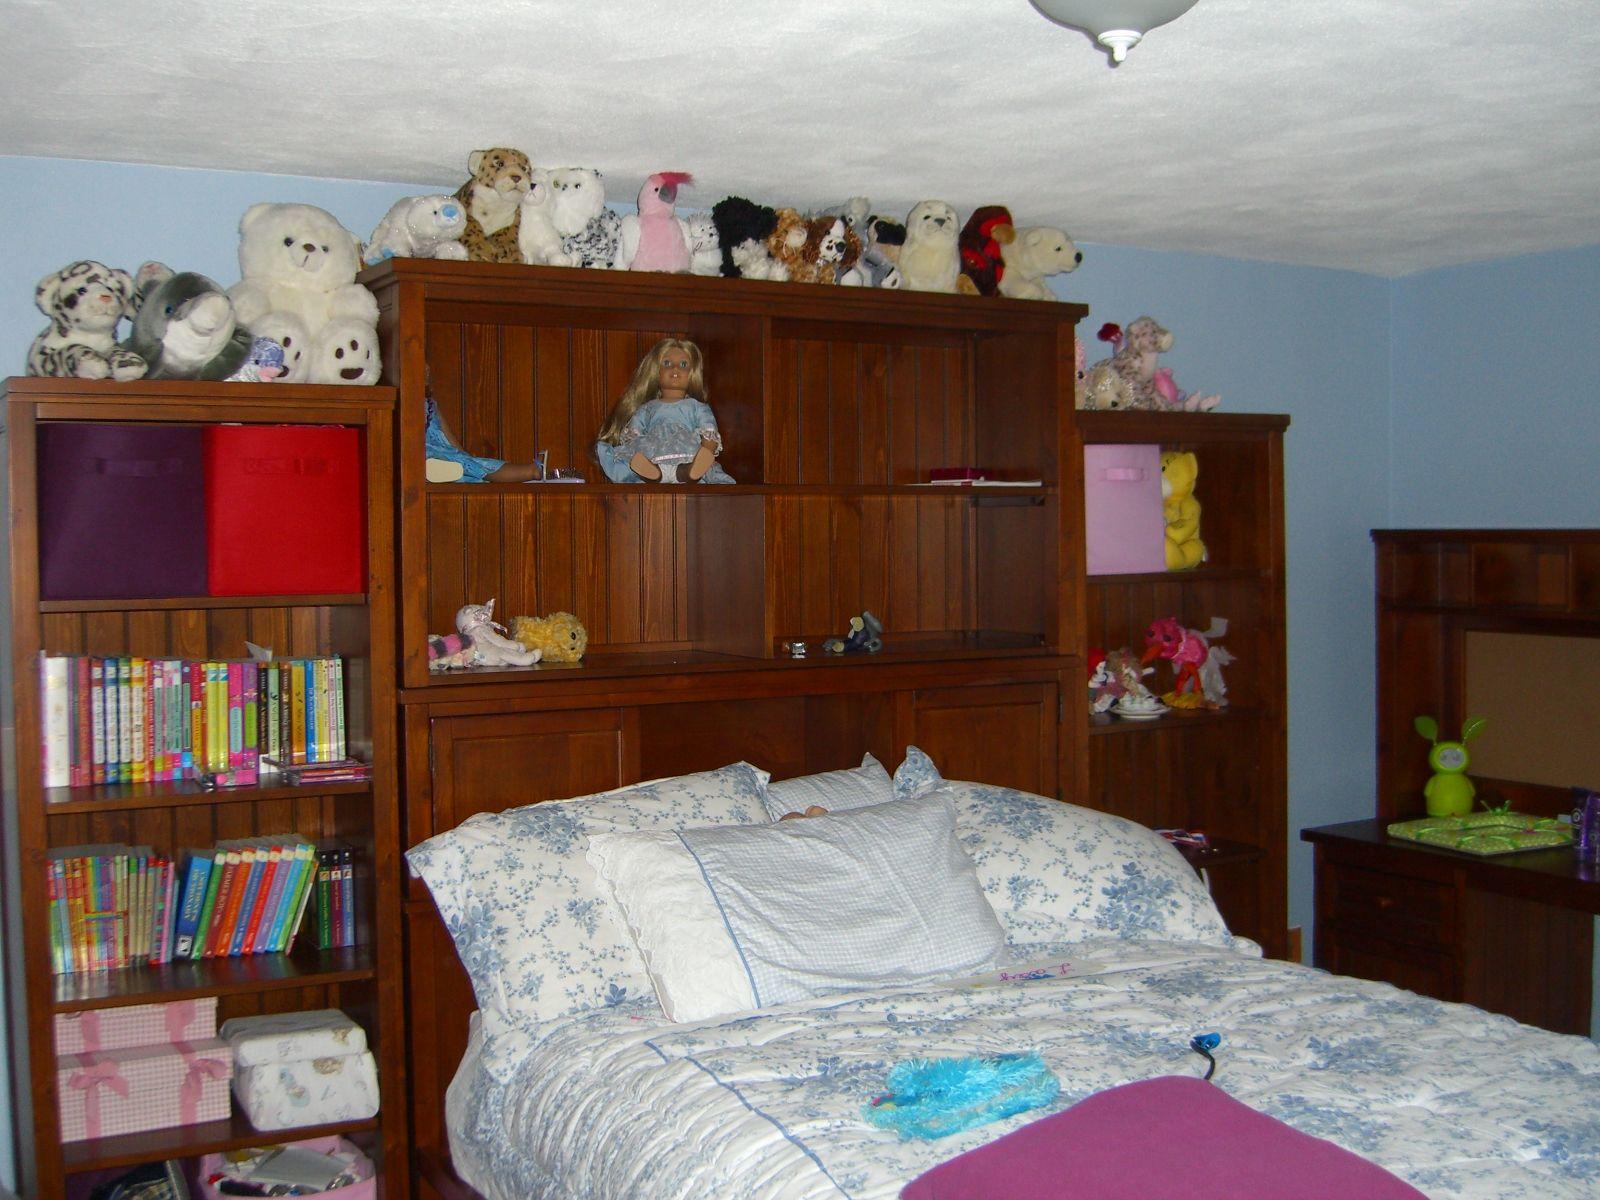 Becca's new bedroom set